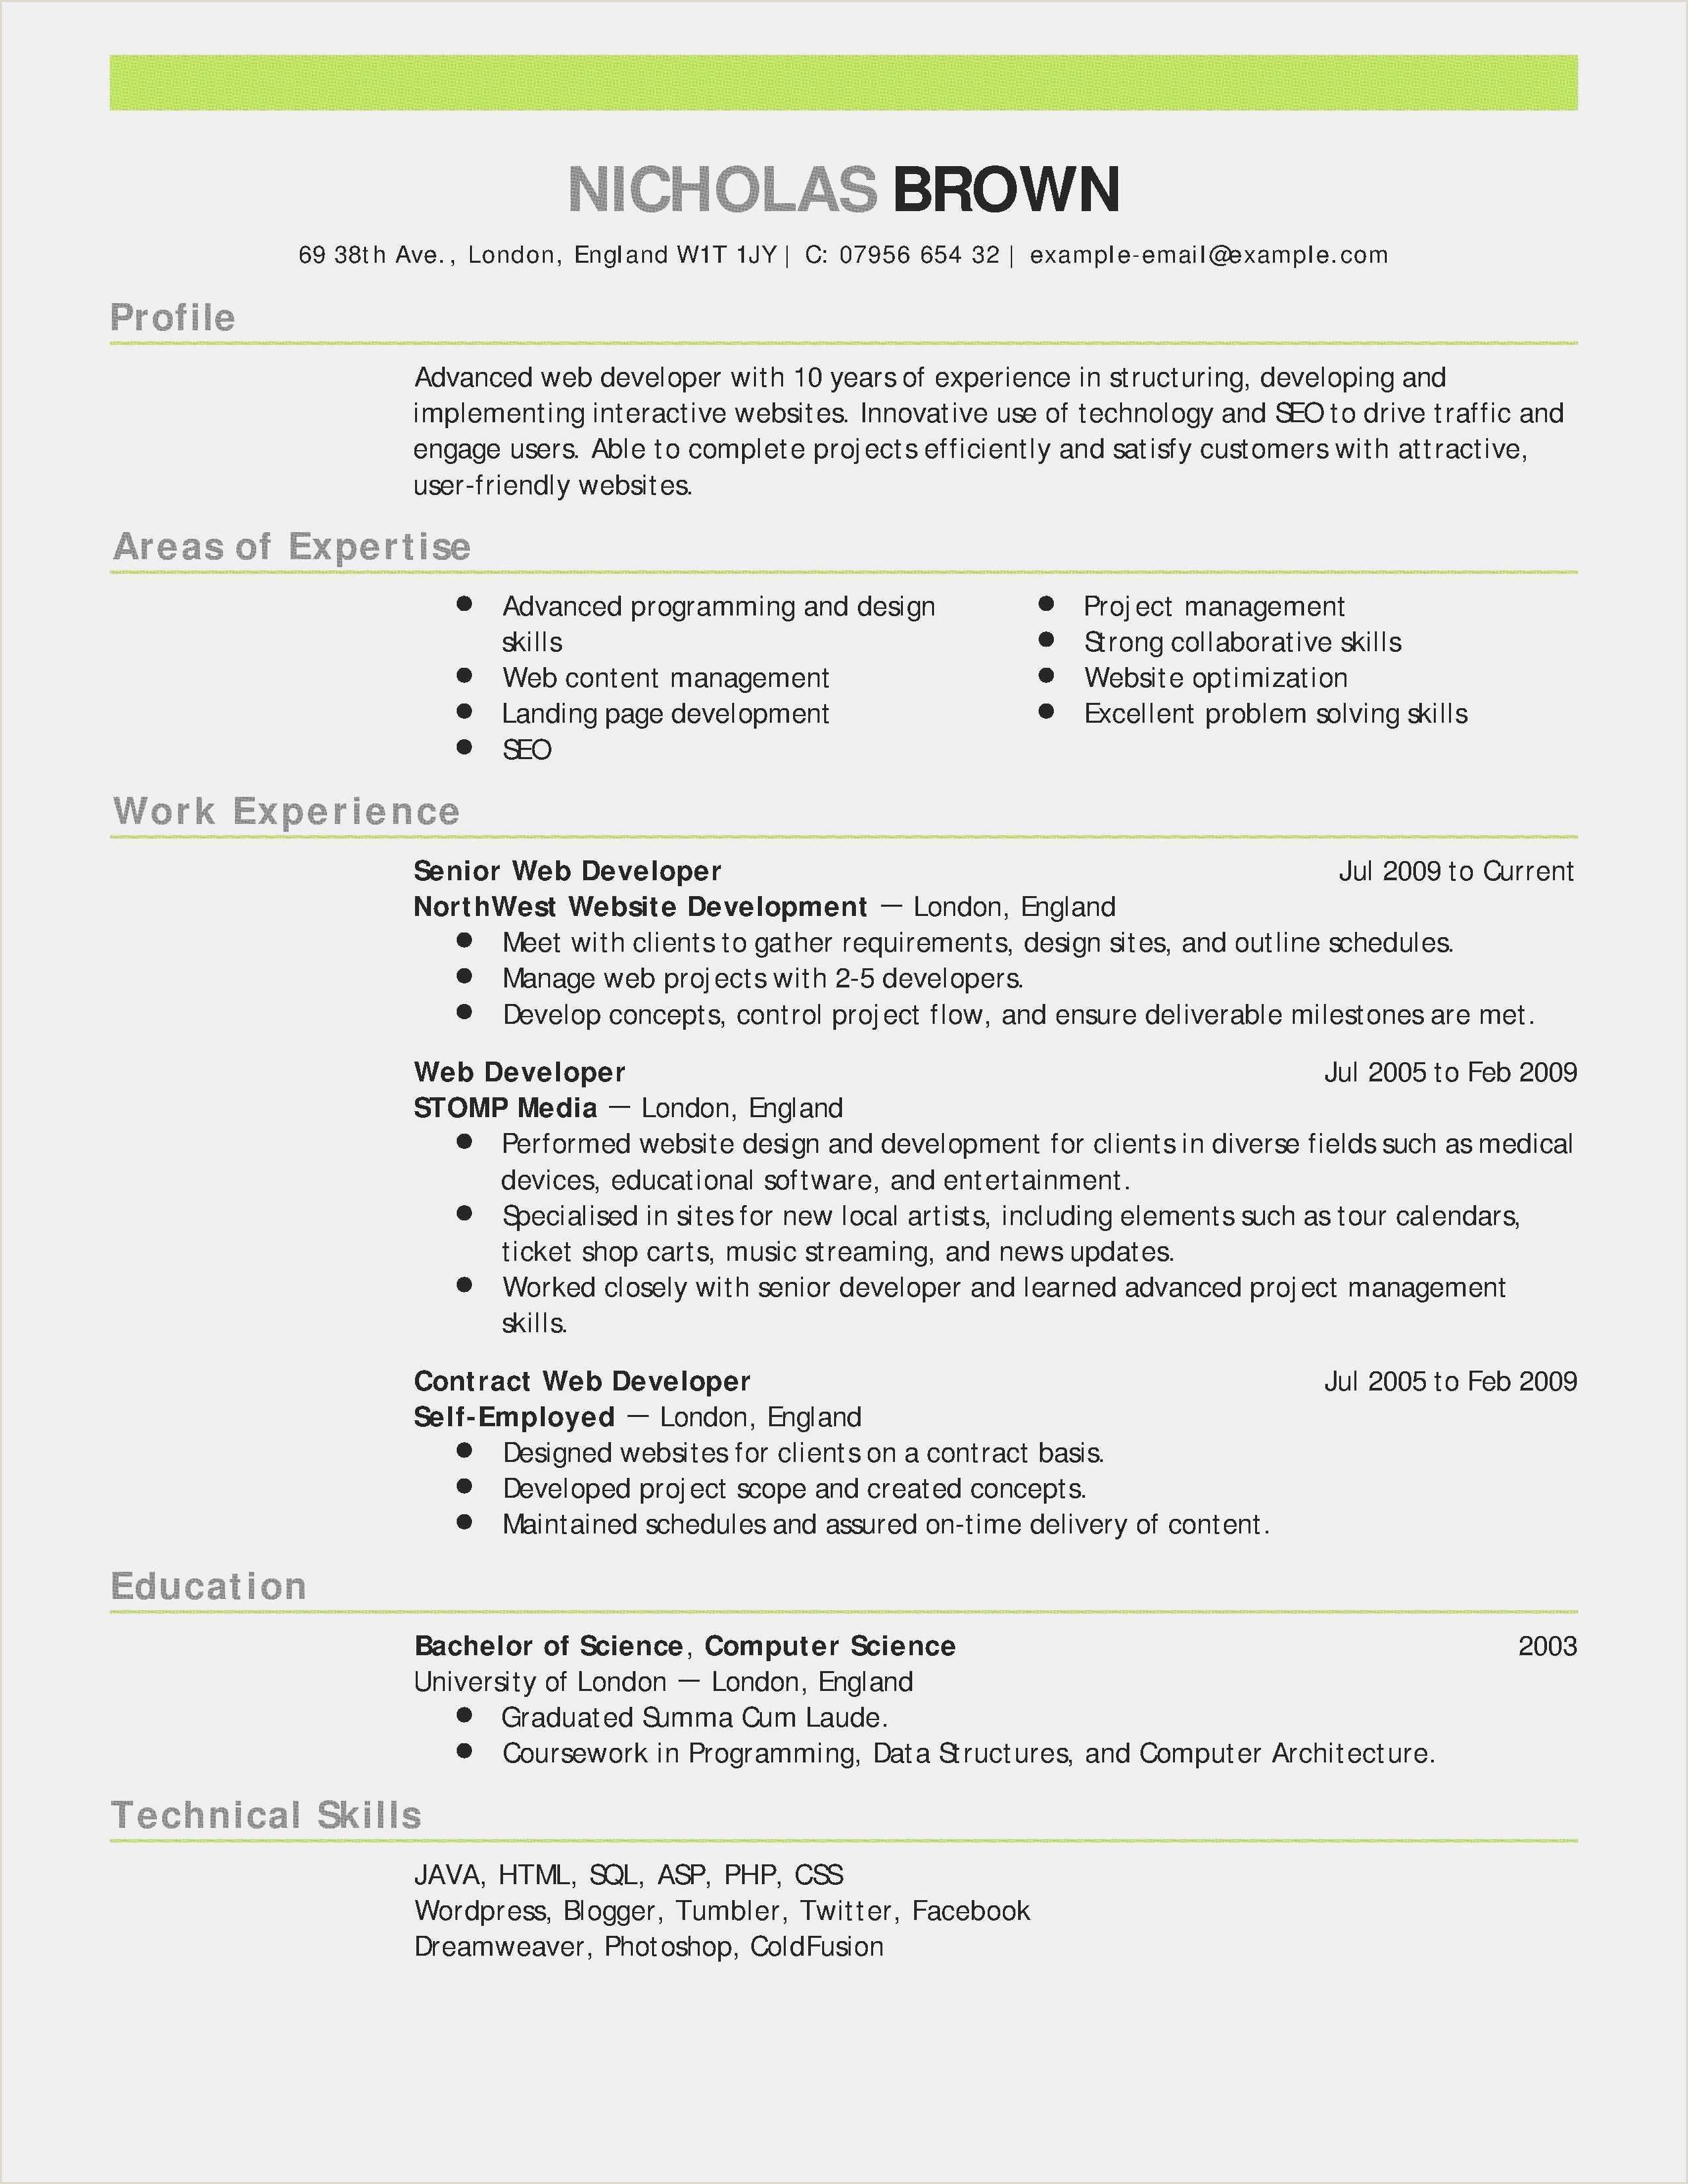 Download Sample Resume Doc New Unique Resume Sample Doc Best